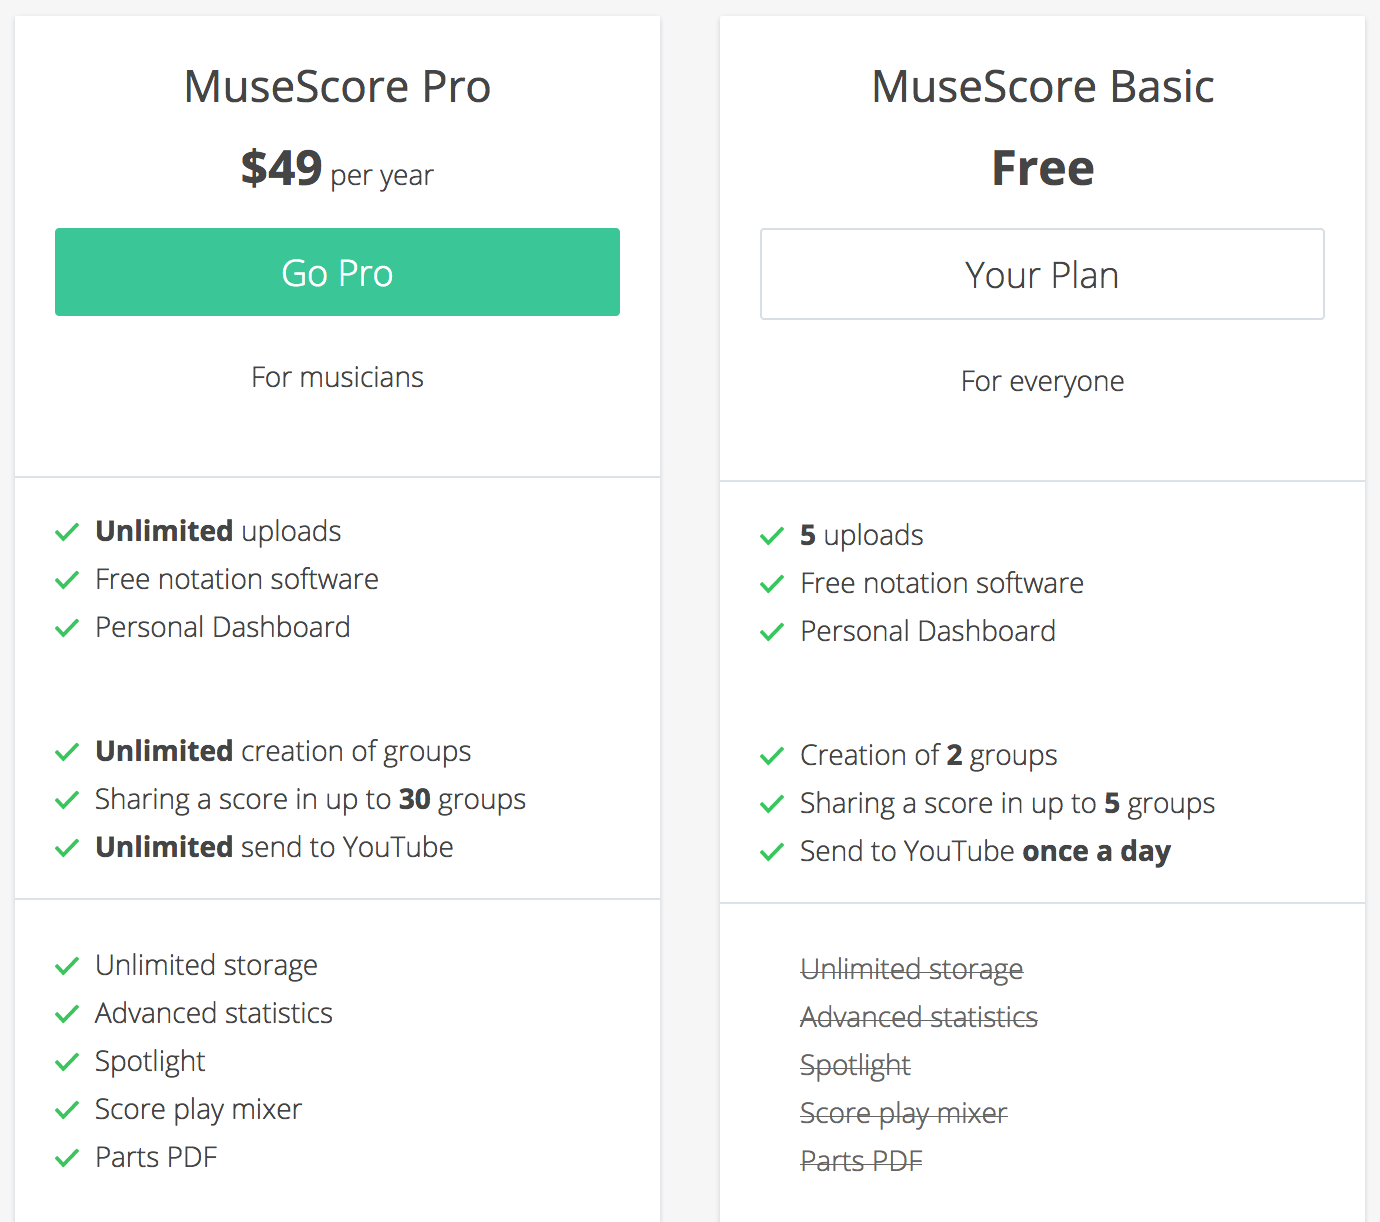 Score Play Mixer and Pro Accounts? | MuseScore